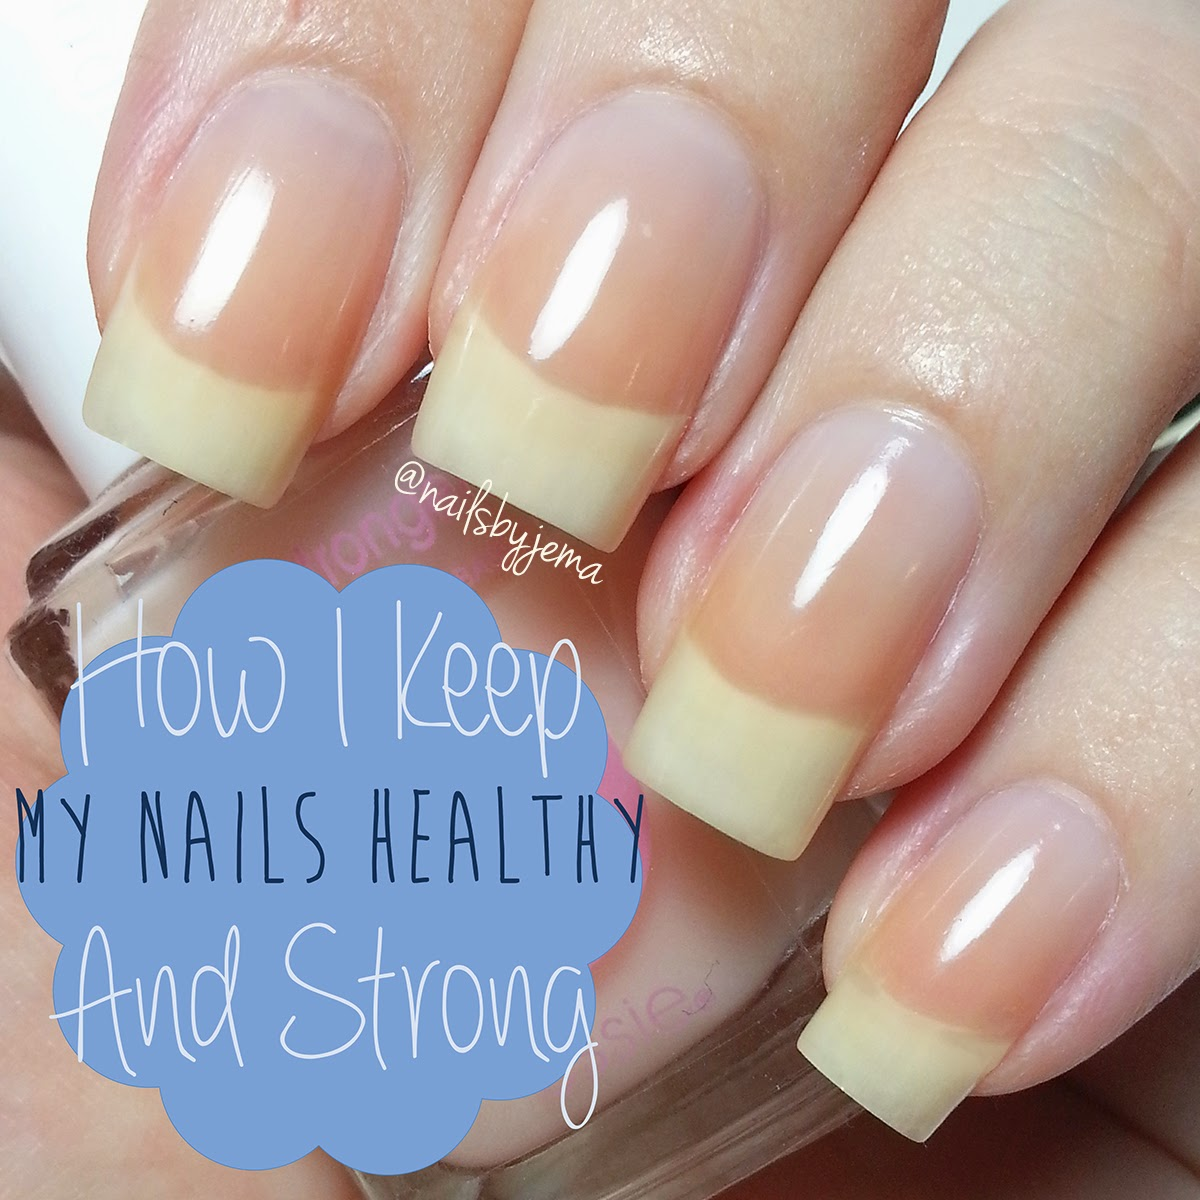 Nails By Jema: My Nail Routine & How I Keep My Nails Healthy ...